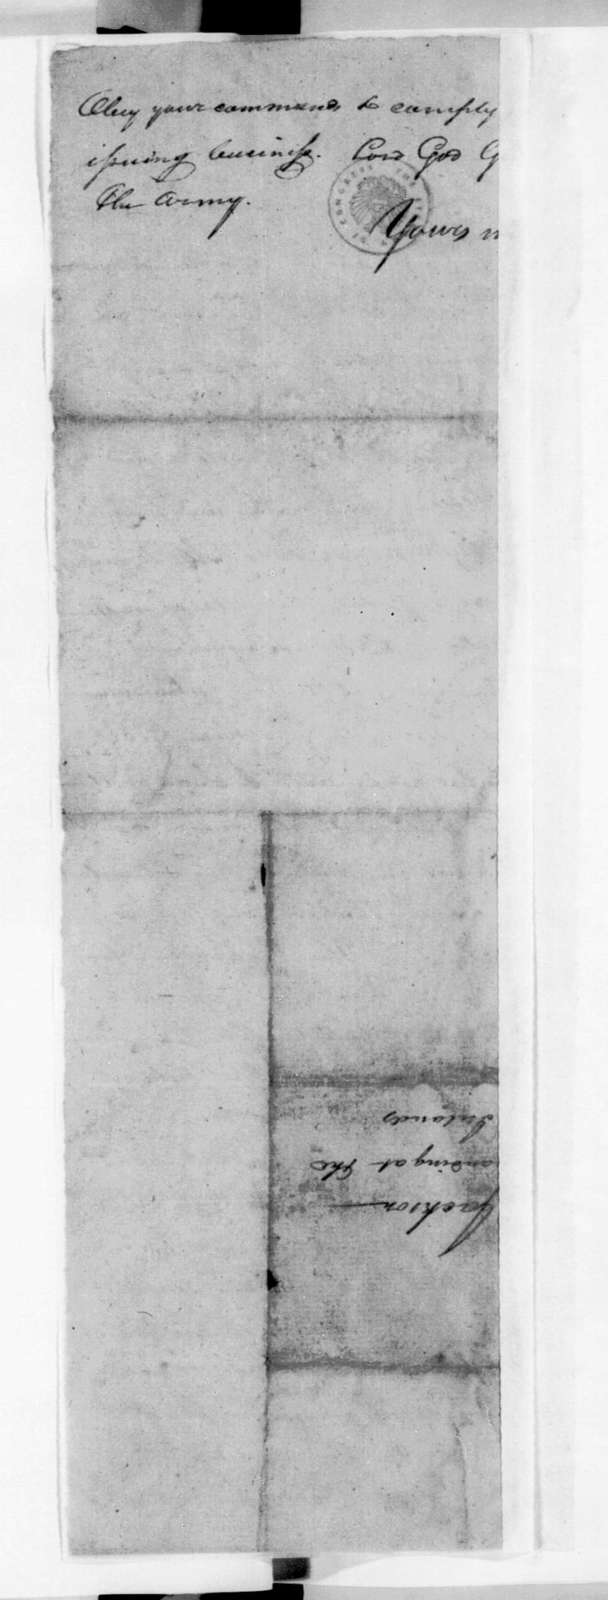 William Preston Anderson to Andrew Jackson, November 8, 1813